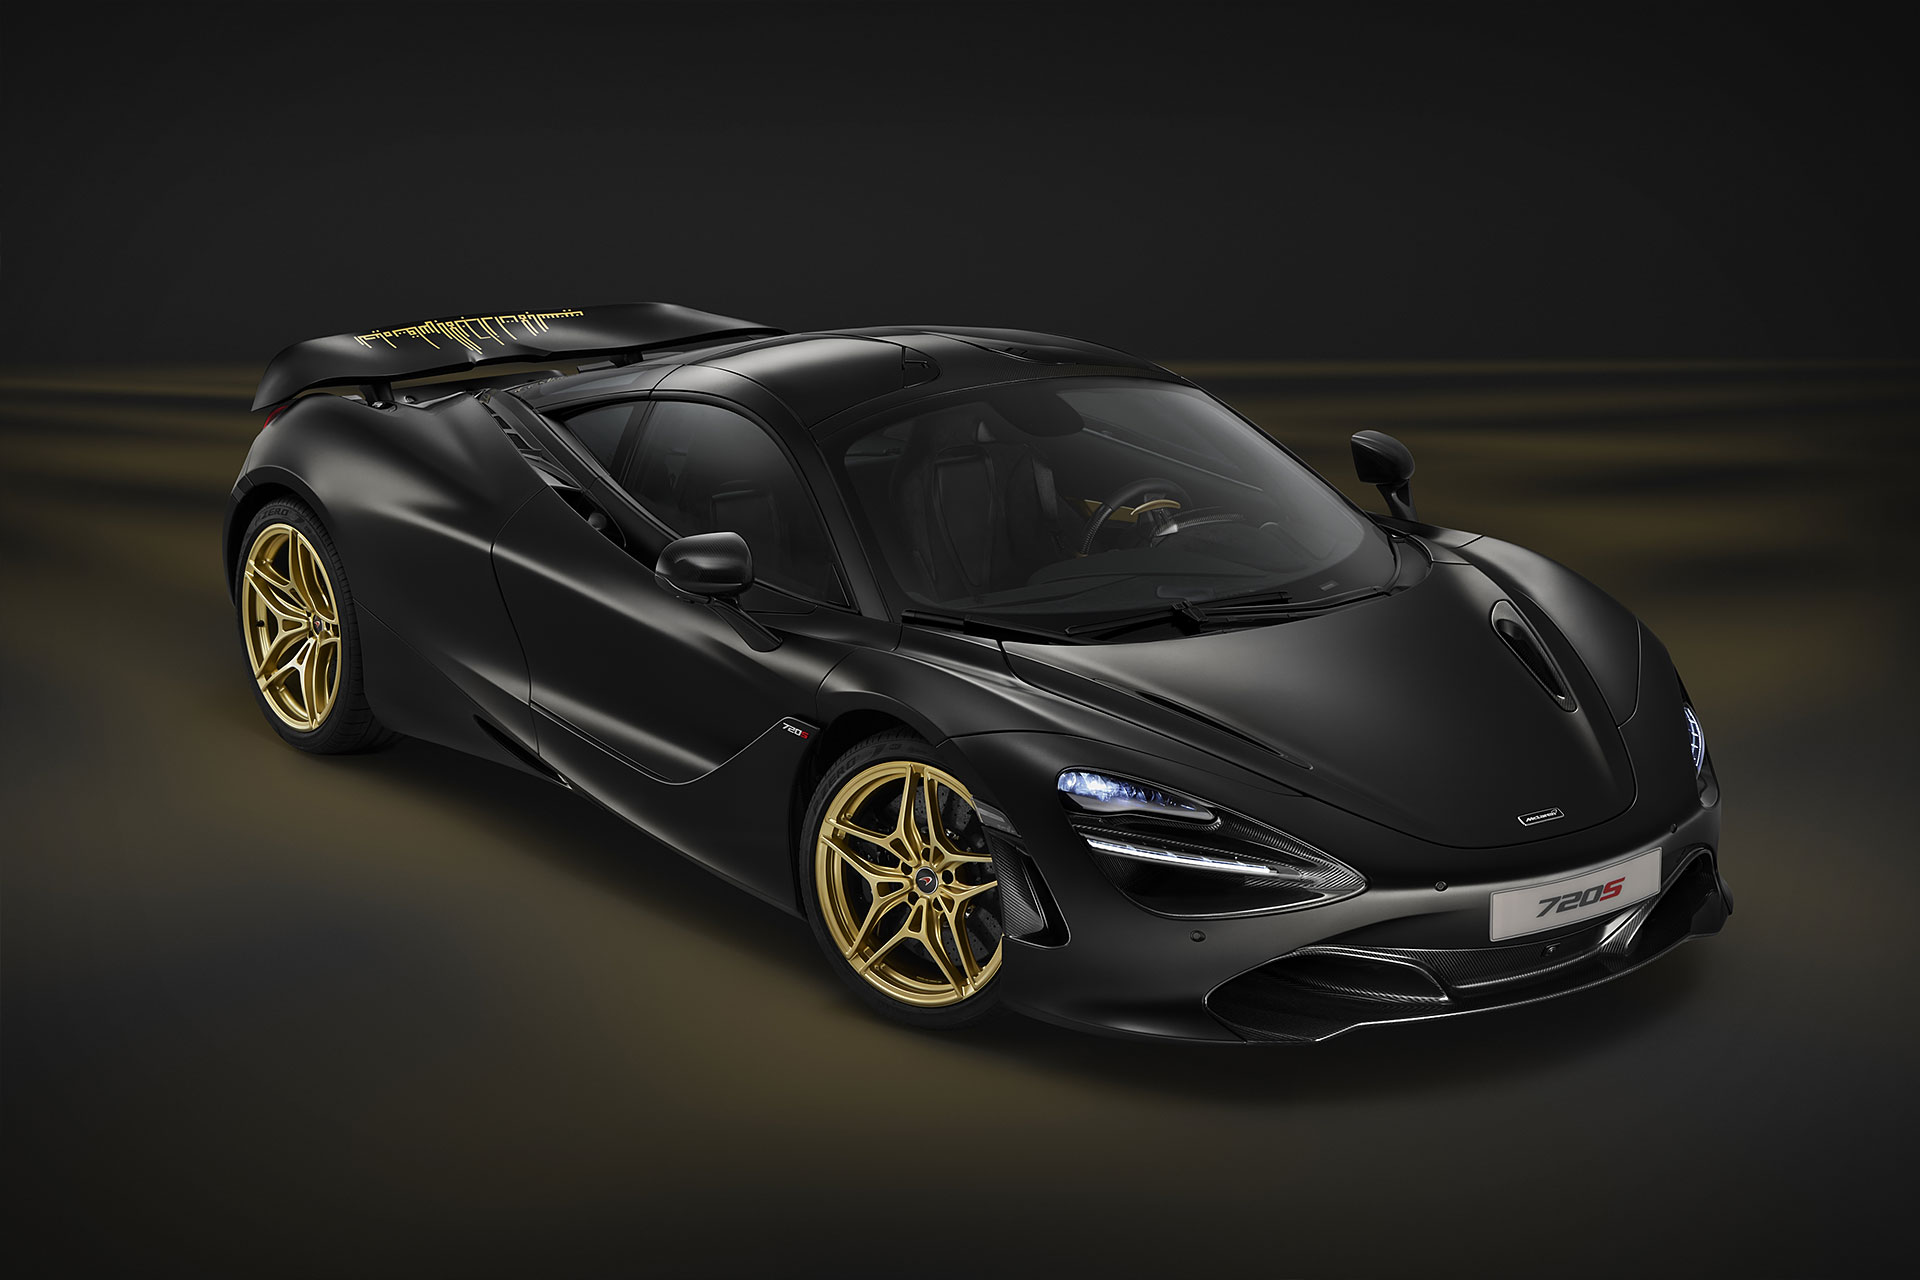 McLaren 720S BM Edition